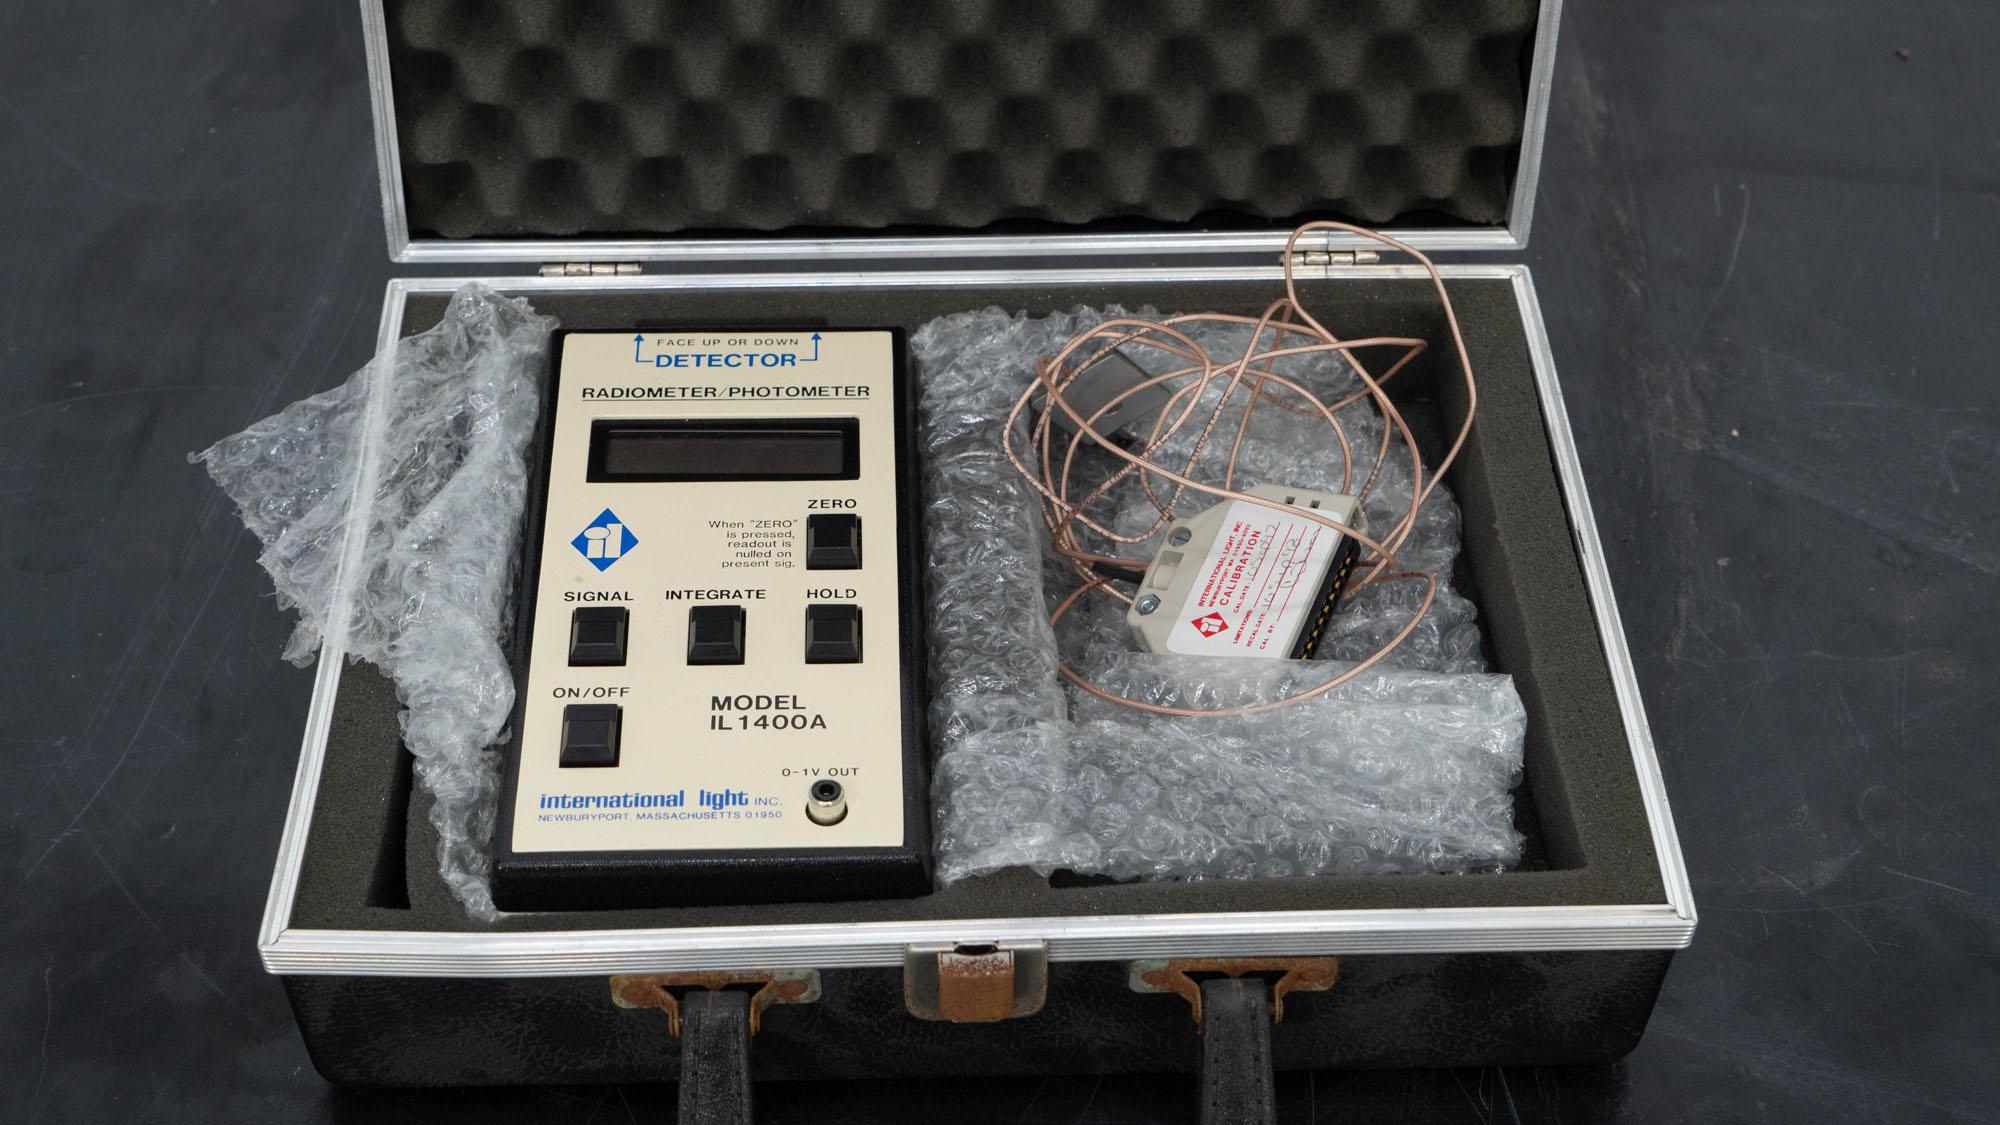 International Ligith Radiometer/photometer, model IL1400A